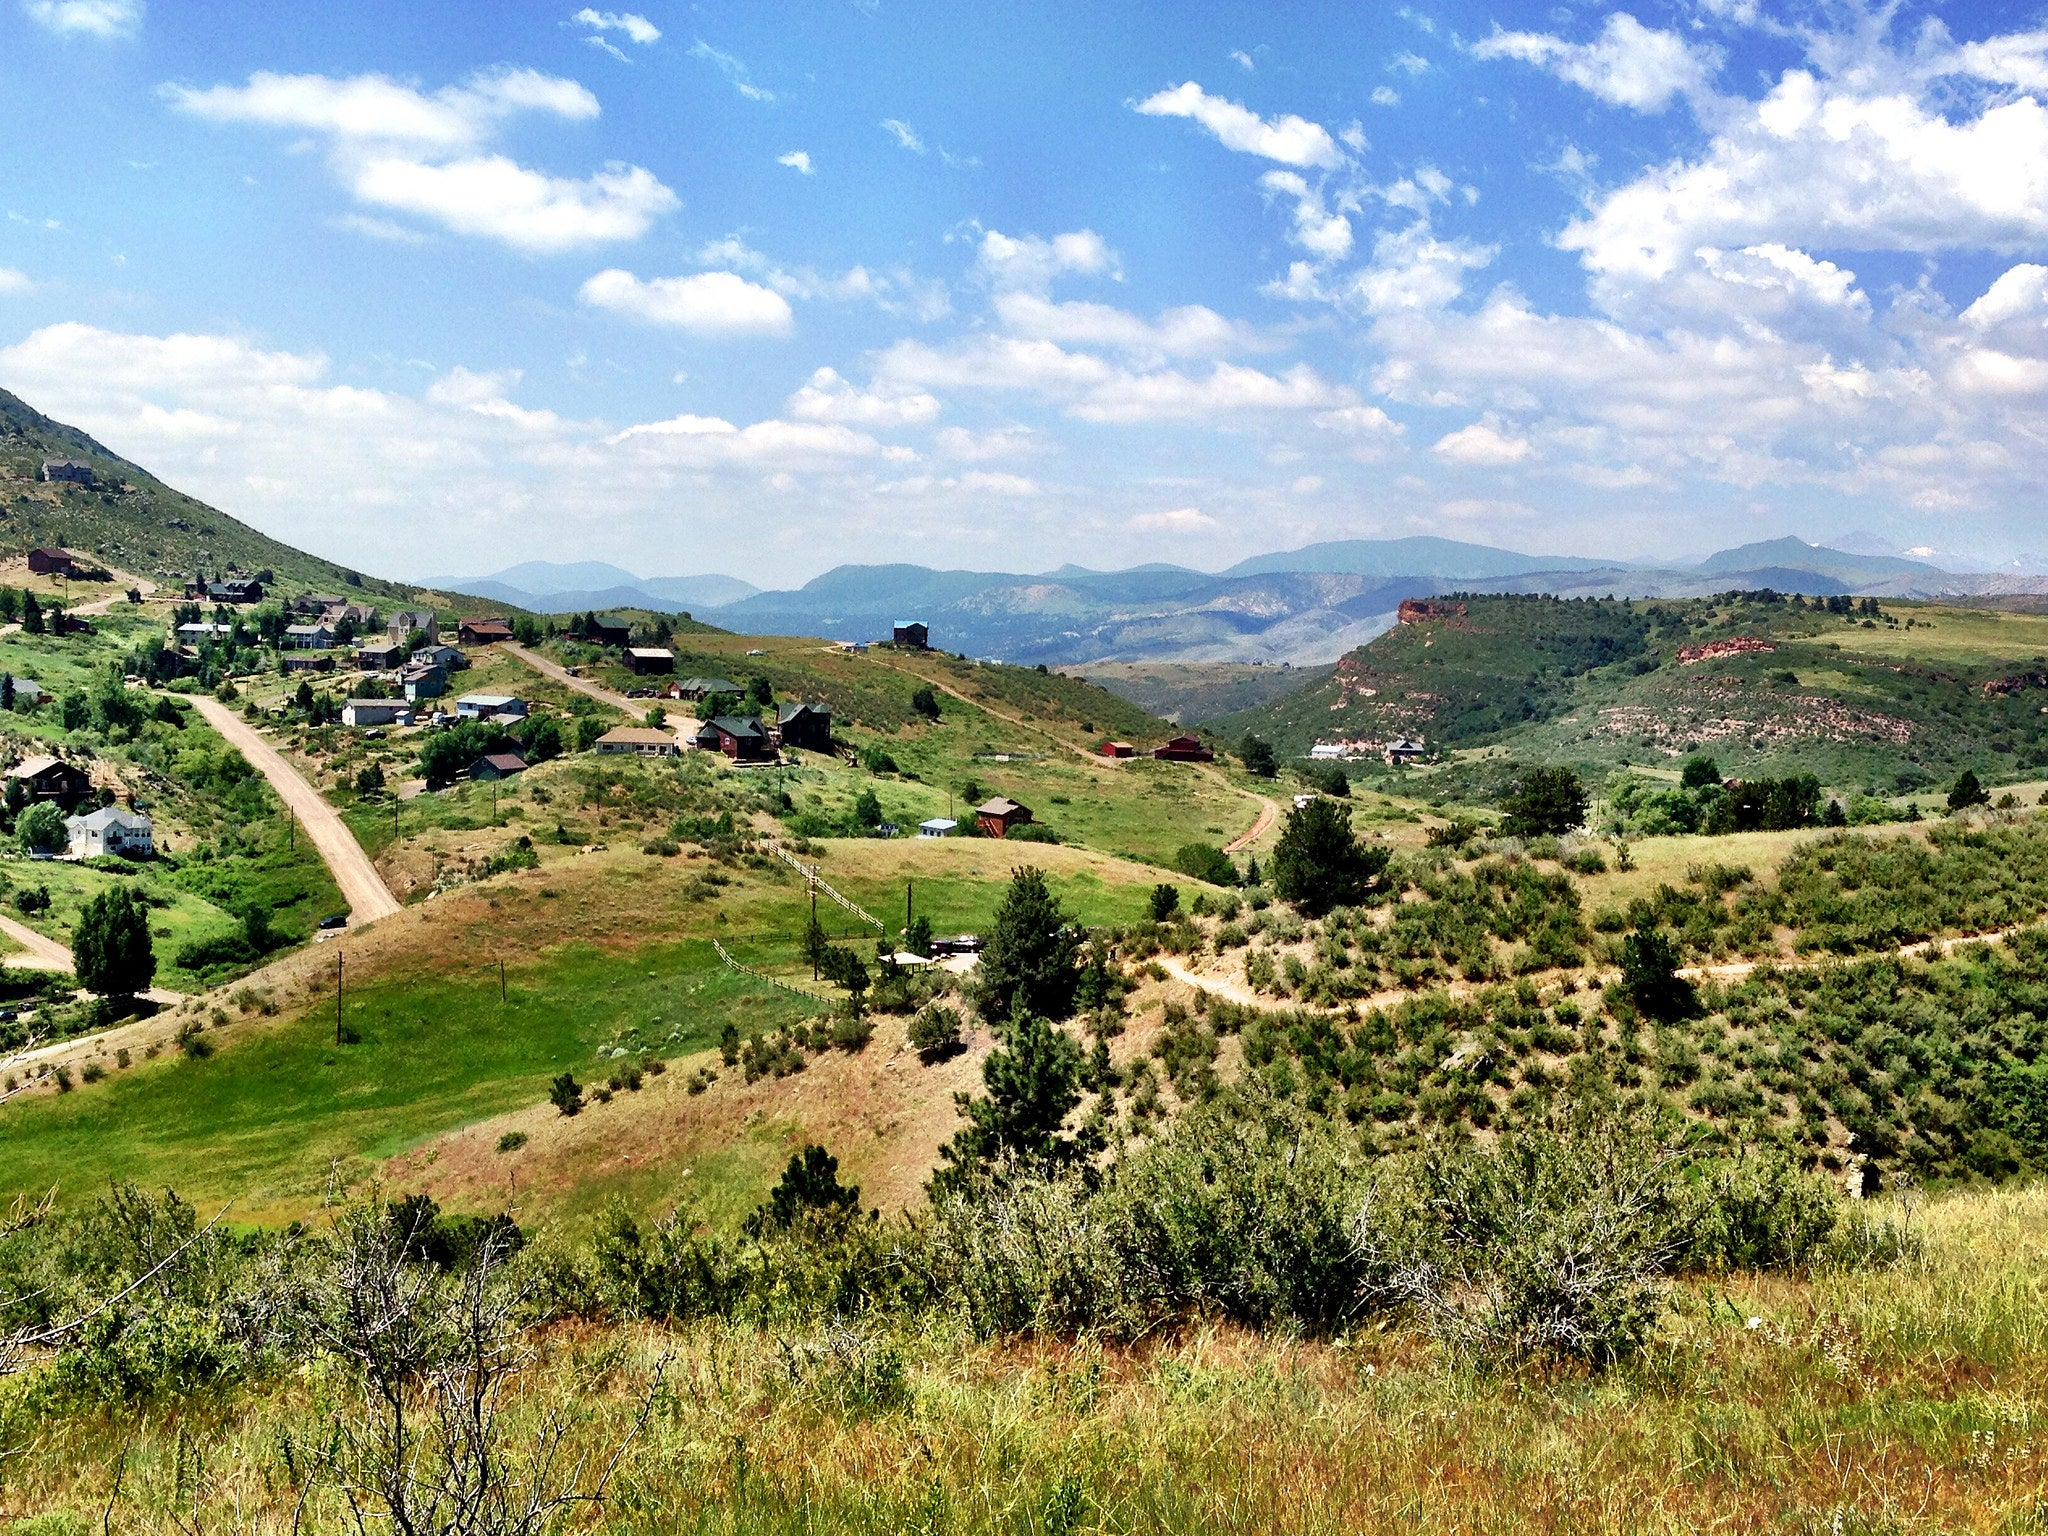 Mt Shasta Ca >> America's Best Trail Towns: Mt. Shasta, CA - Backpacker